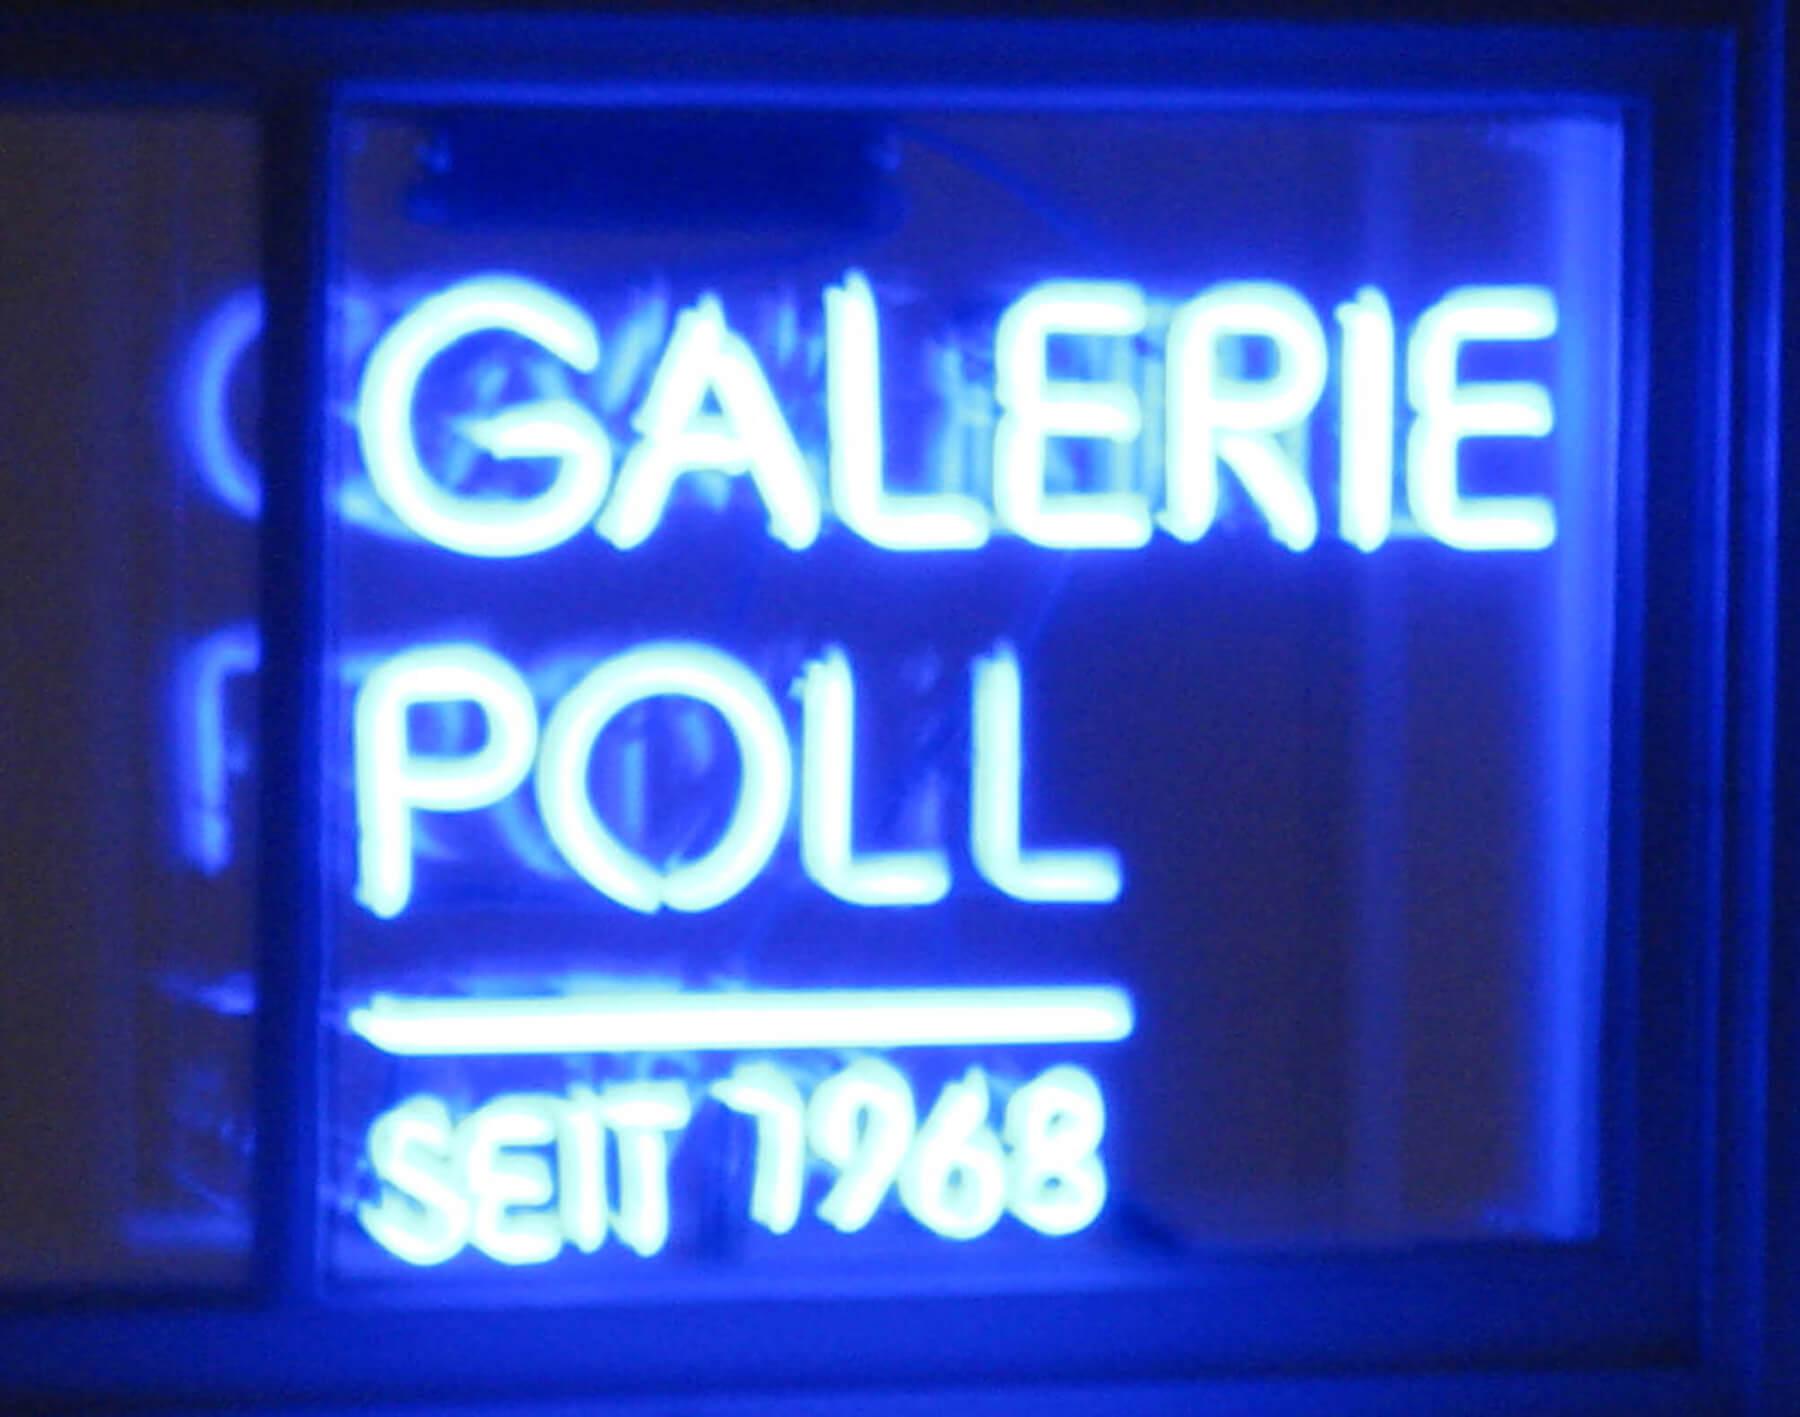 Neonschriftzug im Fenster der Galerie Poll